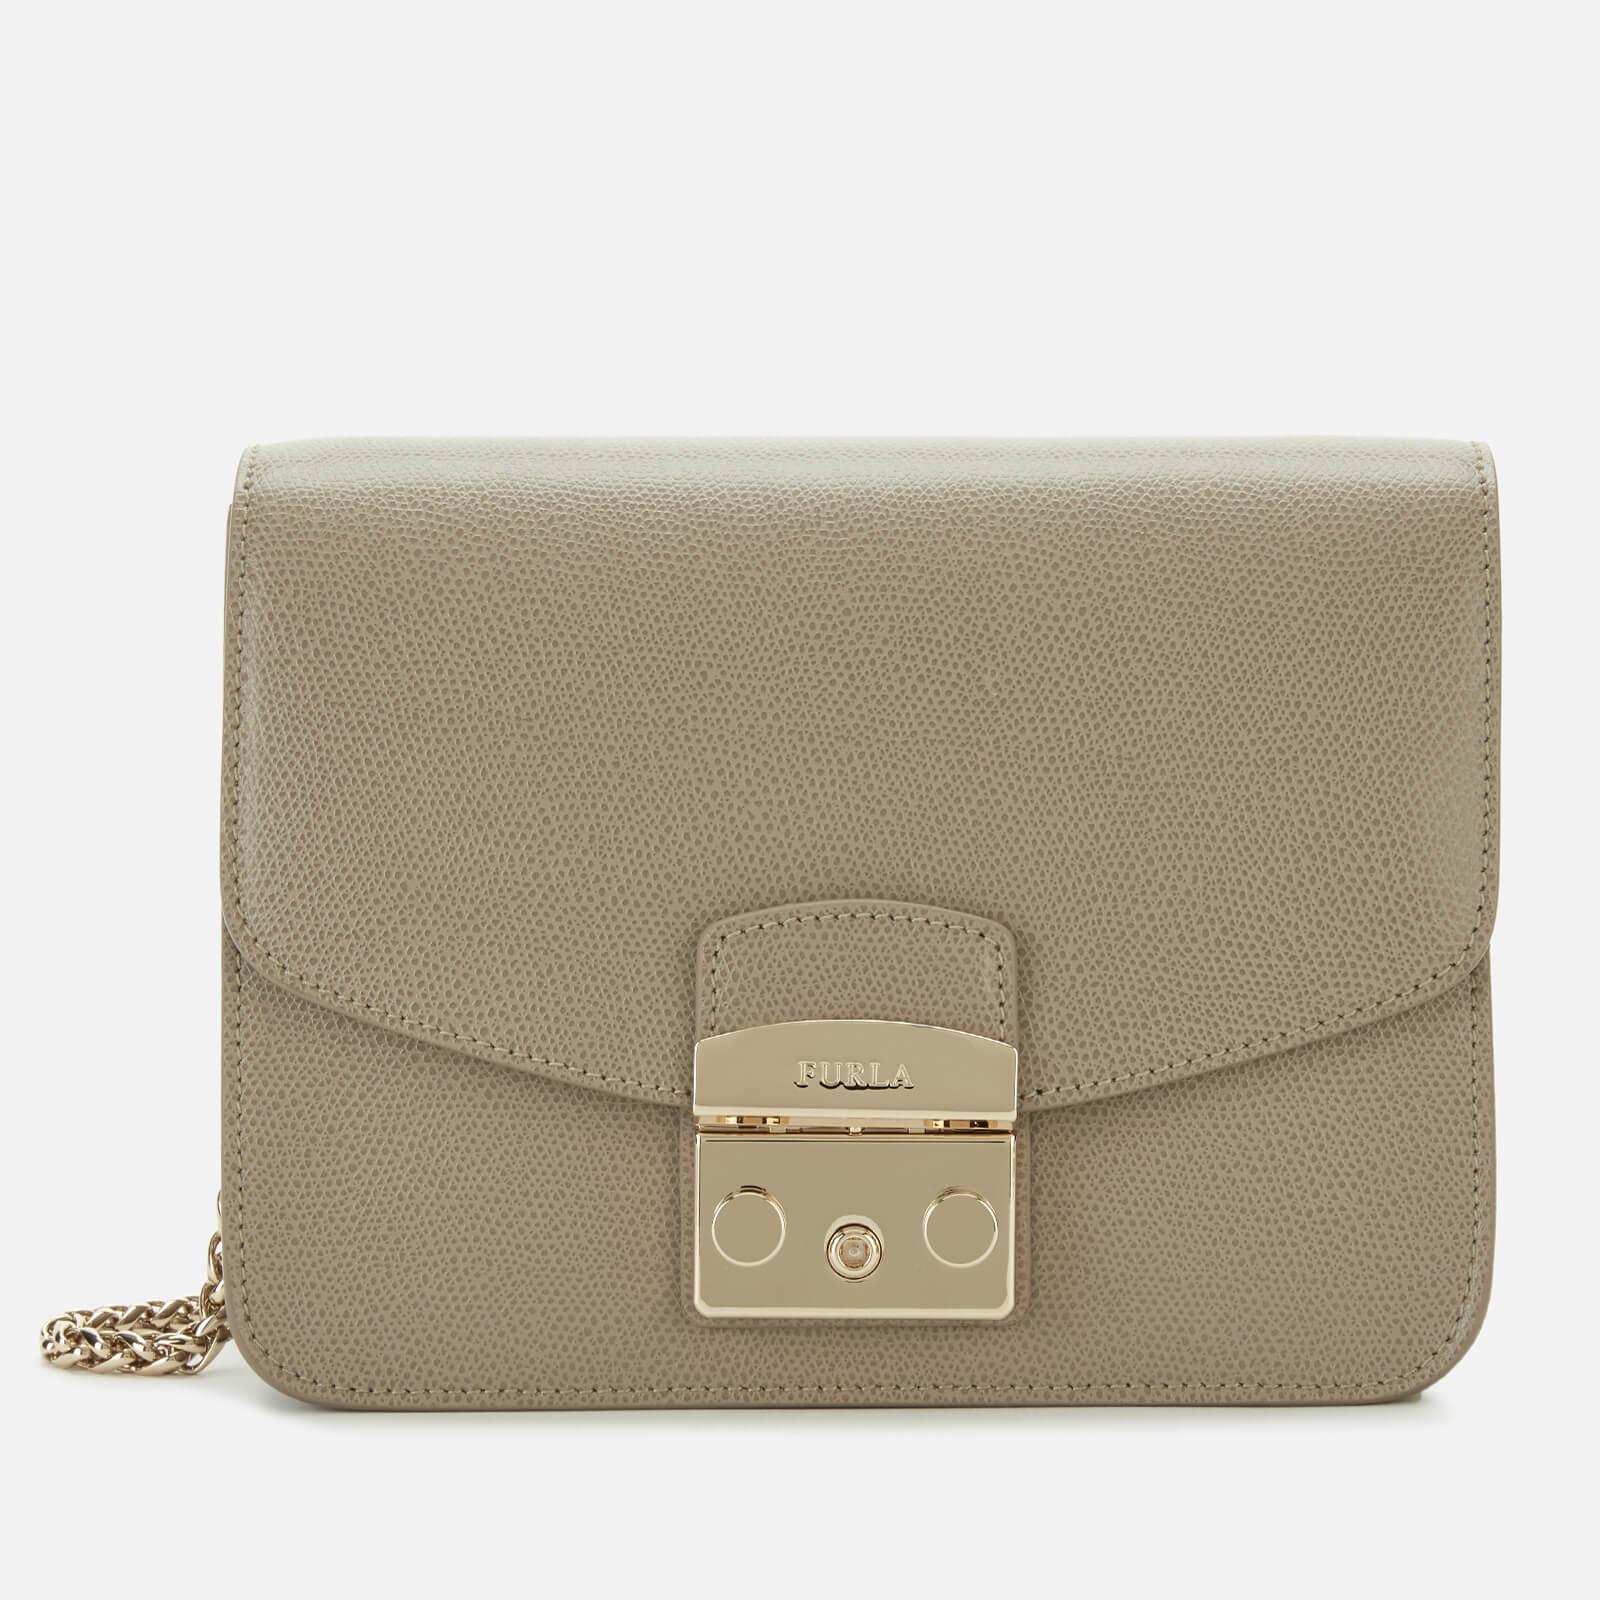 Furla Women's Metropolis Small Cross Body Bag - Beige 原價290英鎊 優惠價174